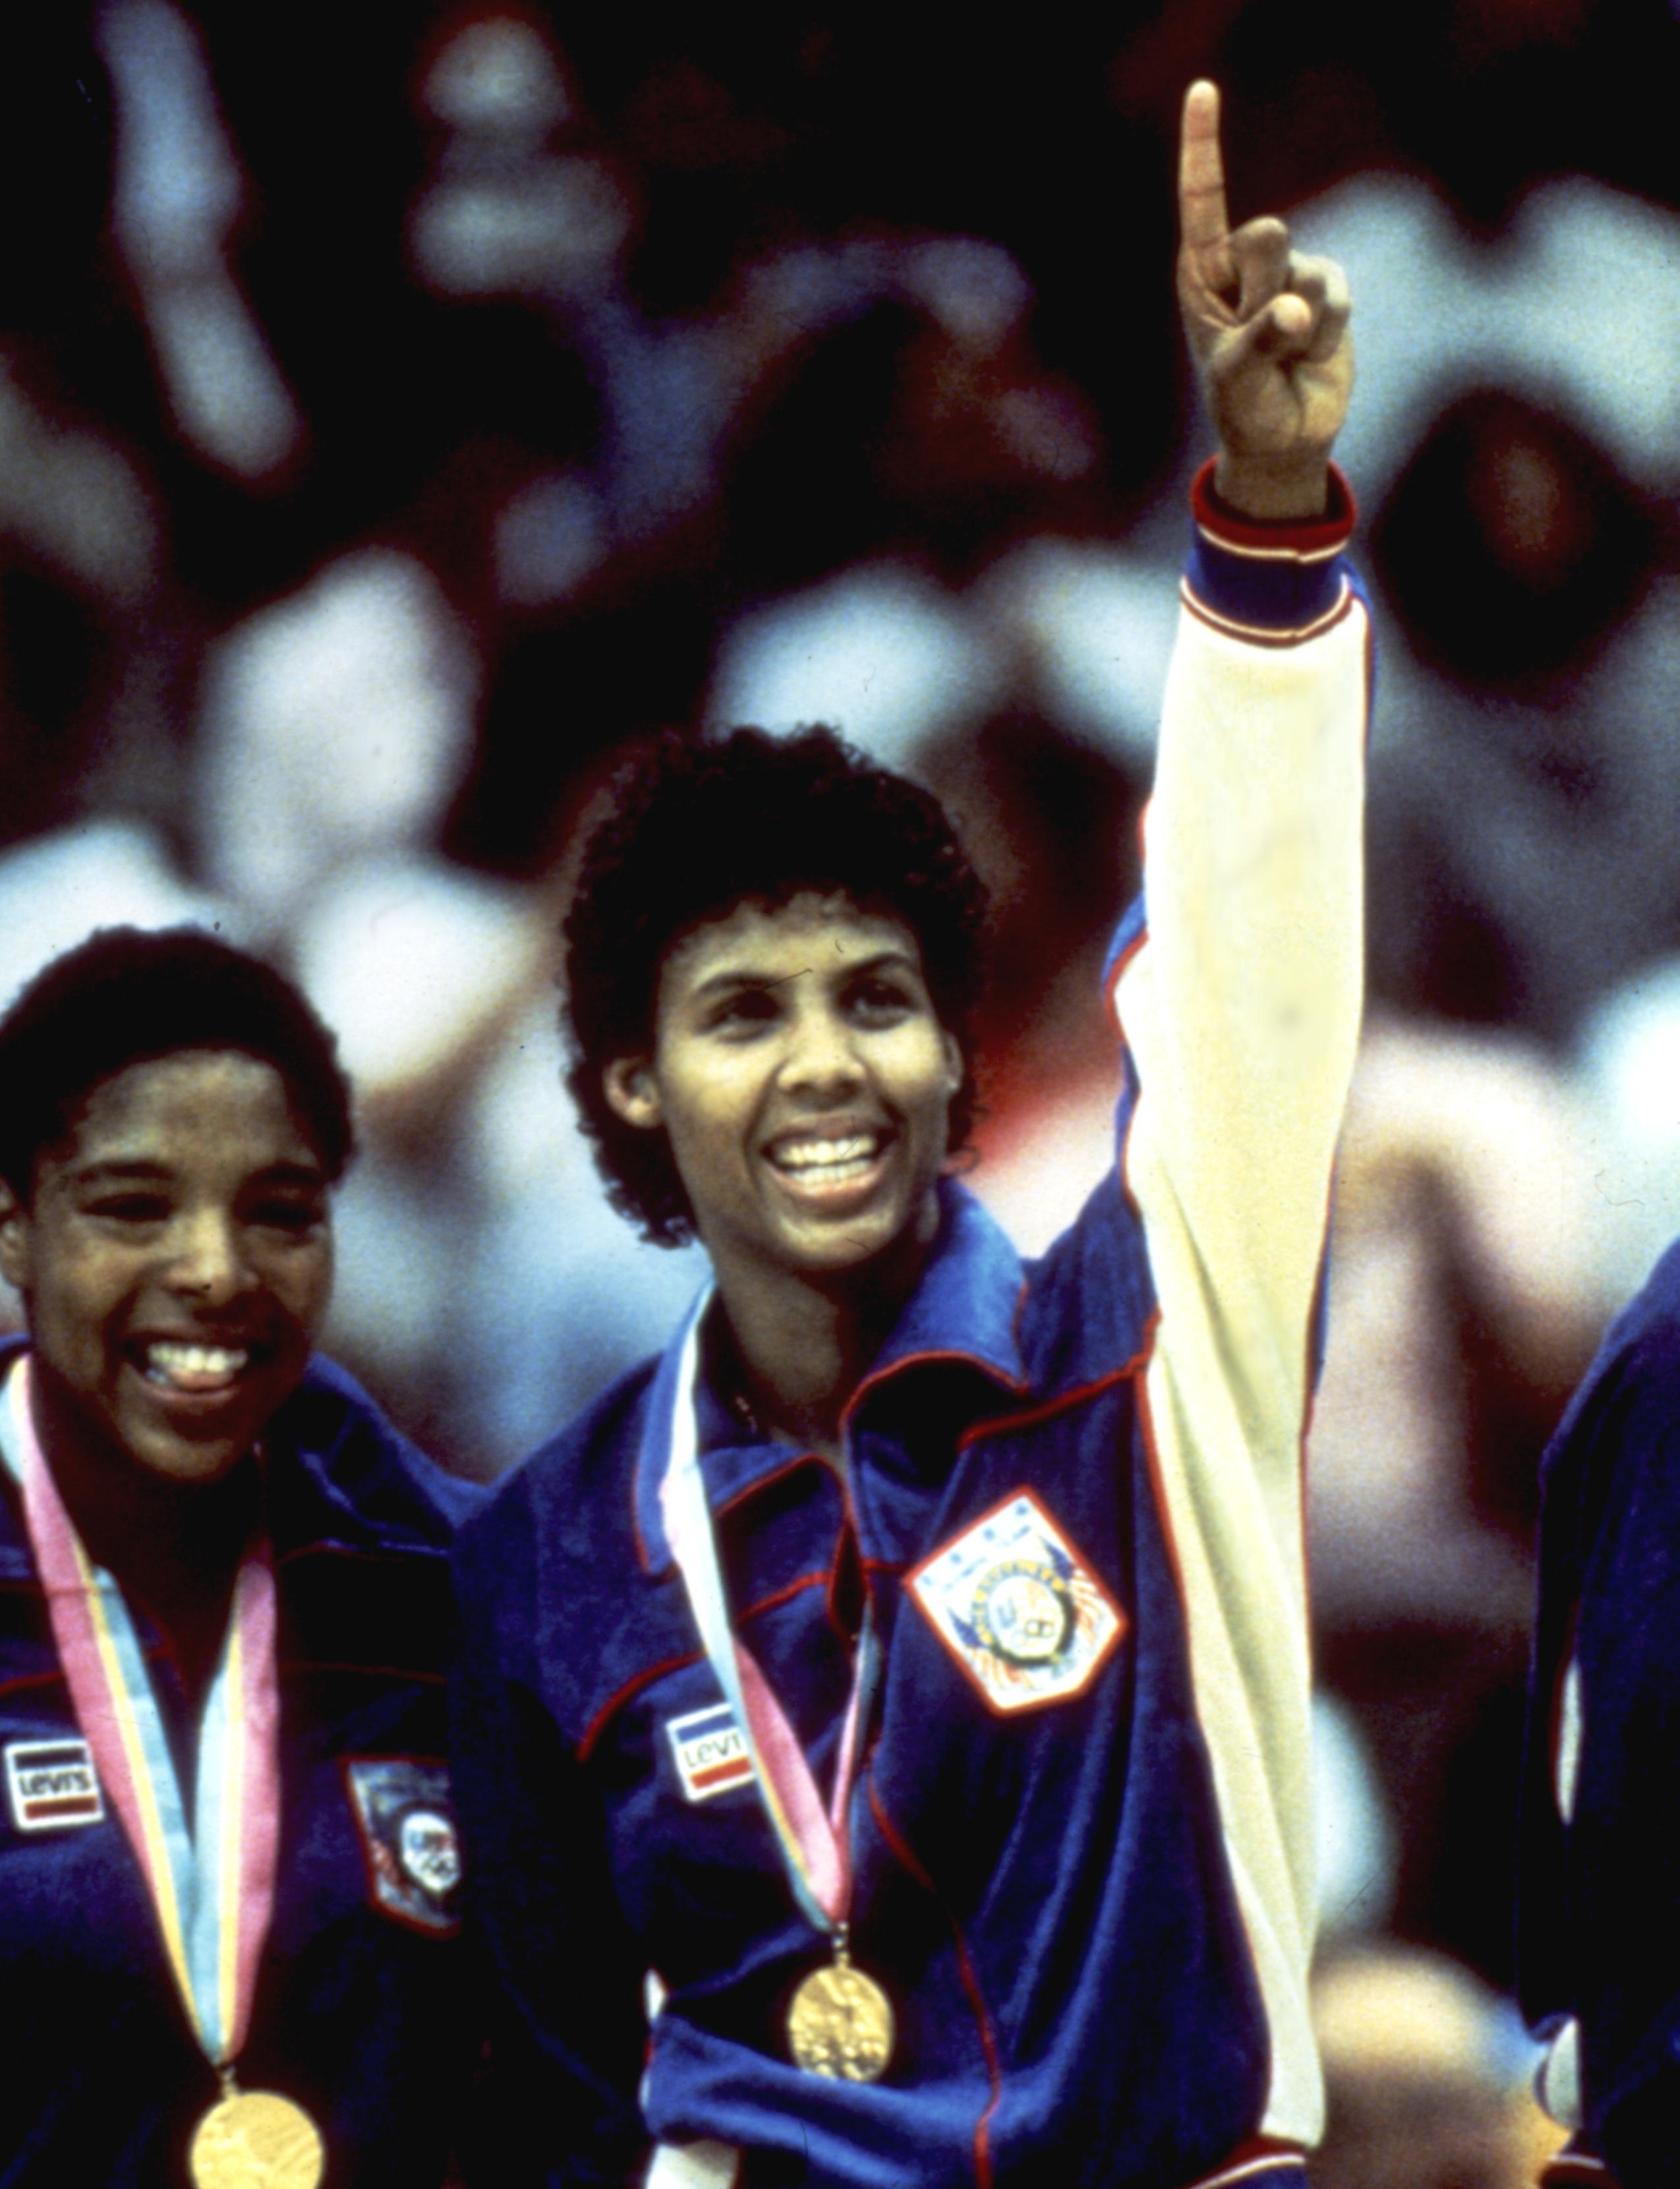 Cheryl Miller, Olympic champion